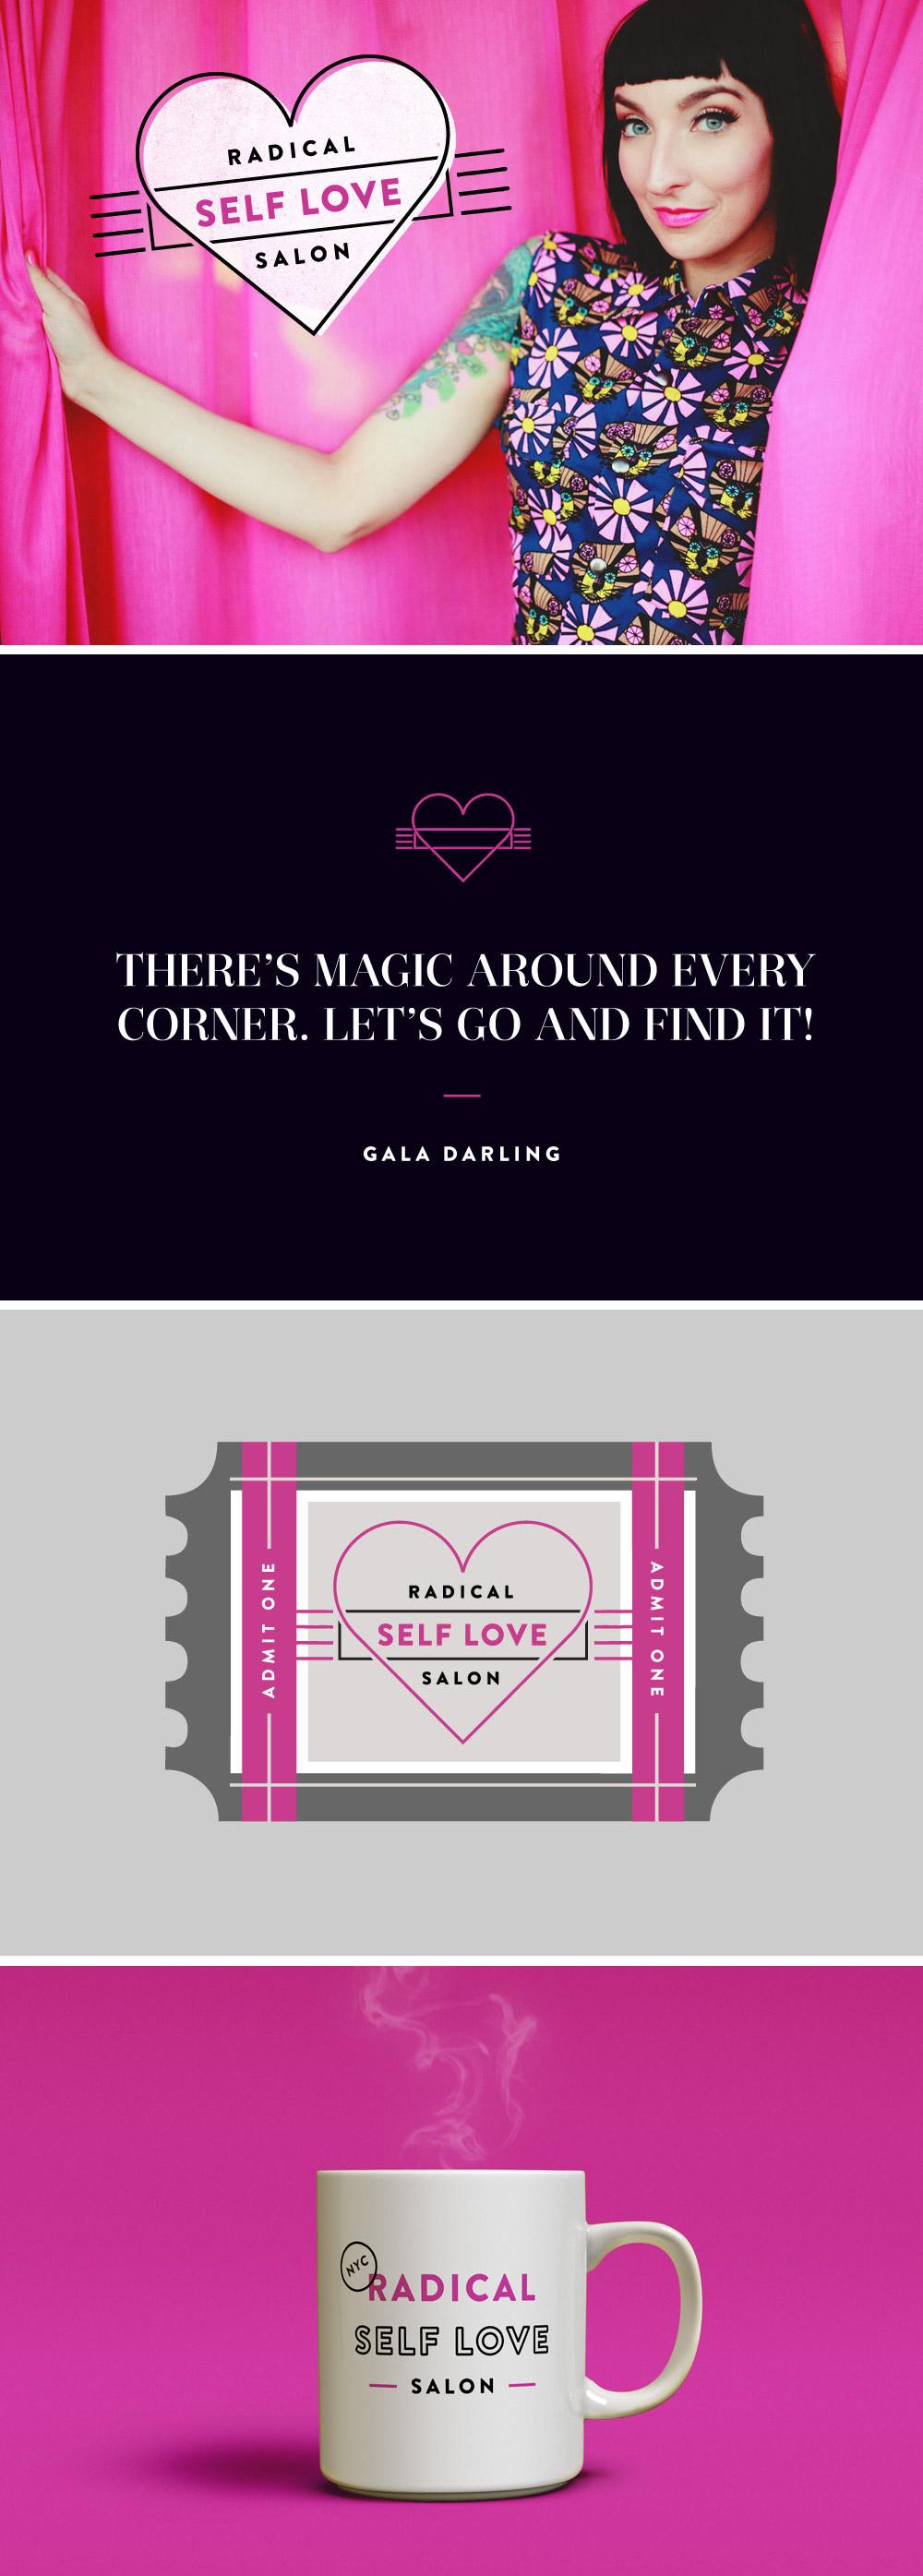 Branch | Gala Darling: Radical Self Love Salon